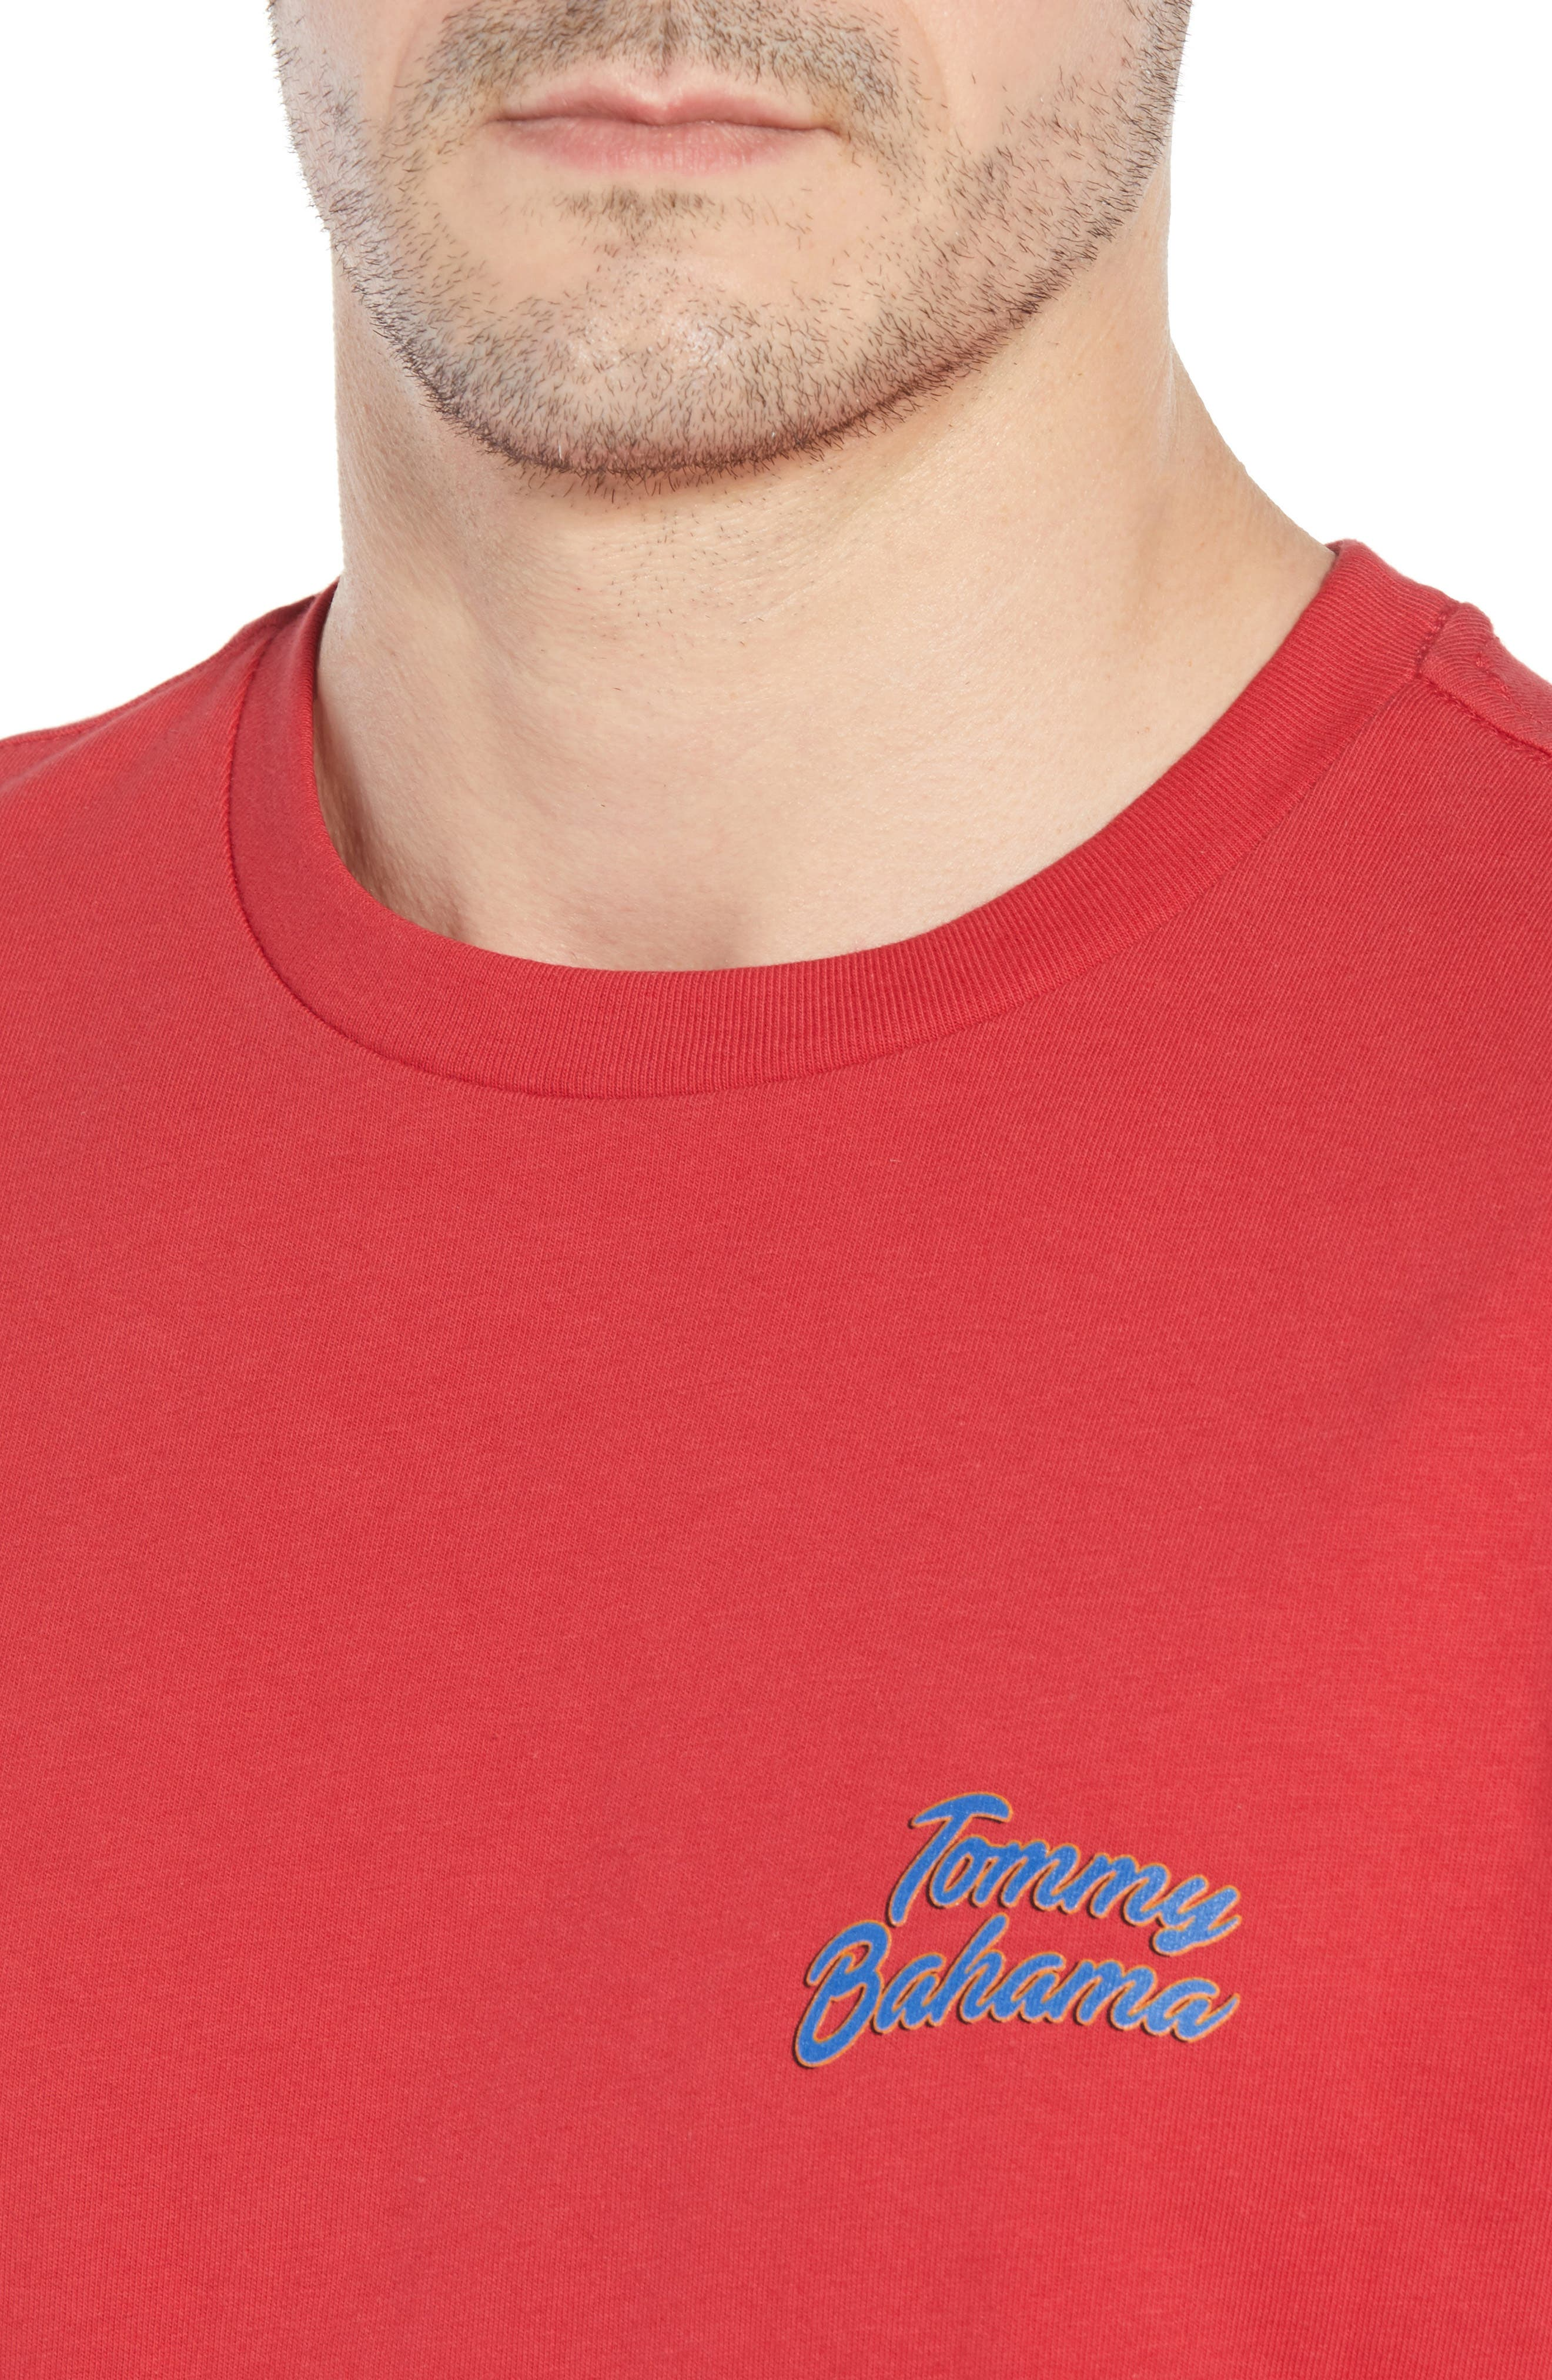 Thirst Base T-Shirt,                             Alternate thumbnail 4, color,                             600